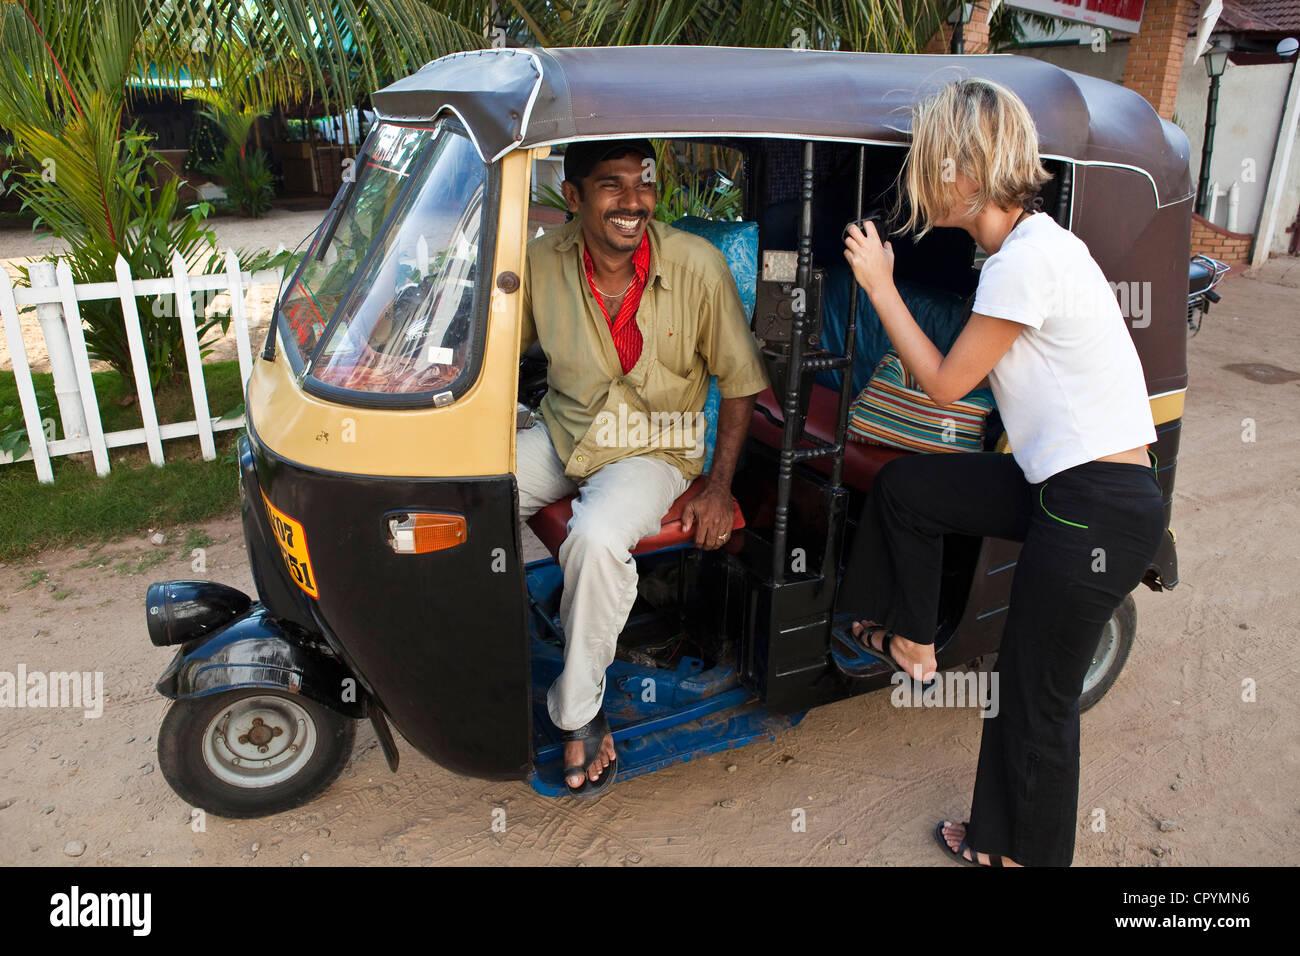 Car interior kochi - India Kerala State Kochi Cochin Tourist Negociating A Tuk Tuk Taxi